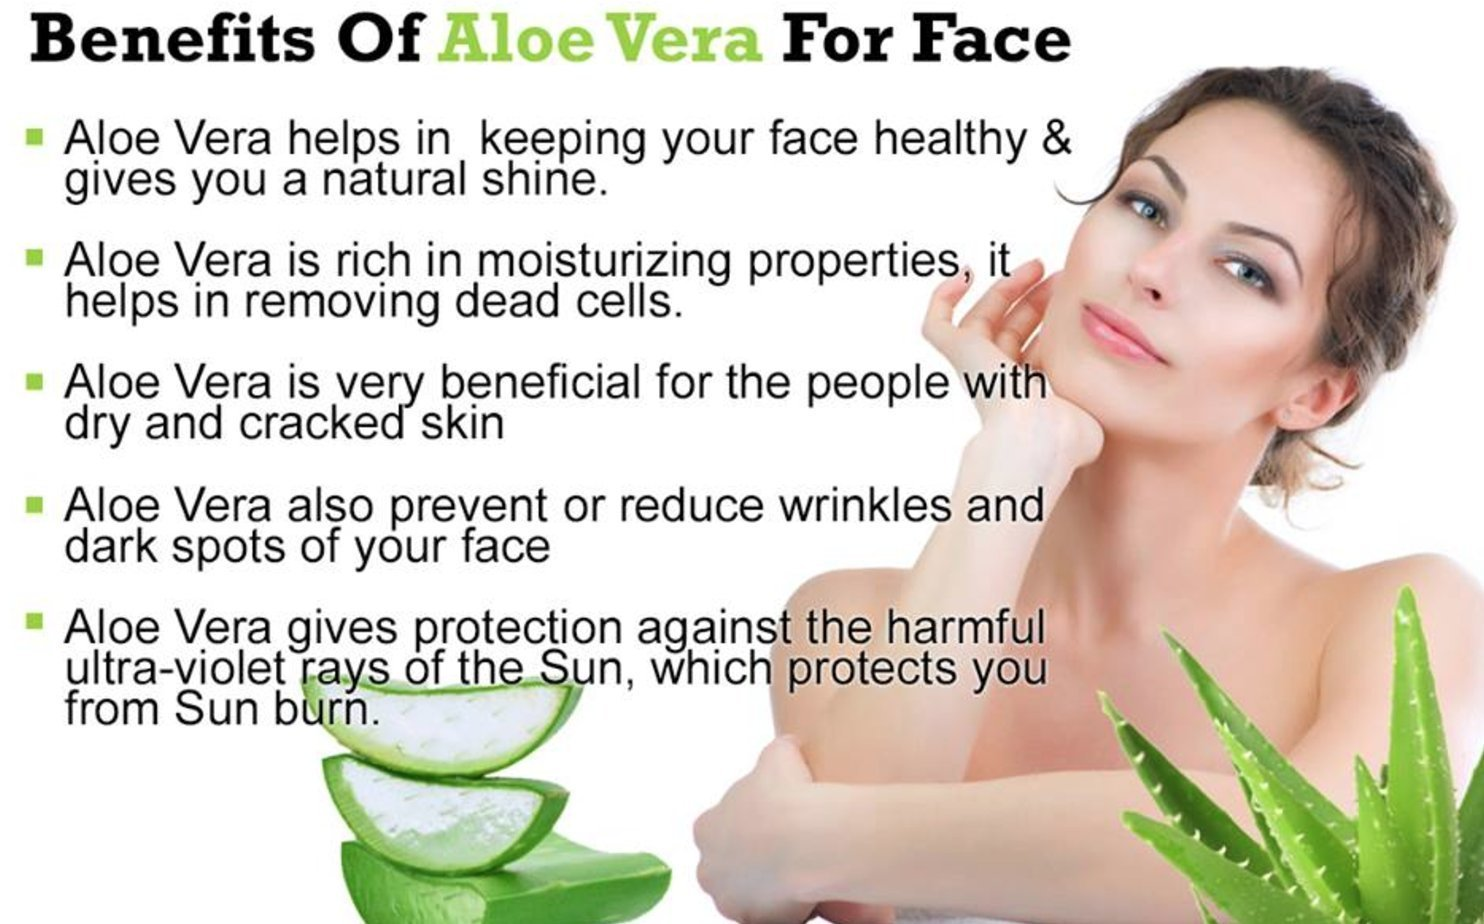 Aloe vera uses for face